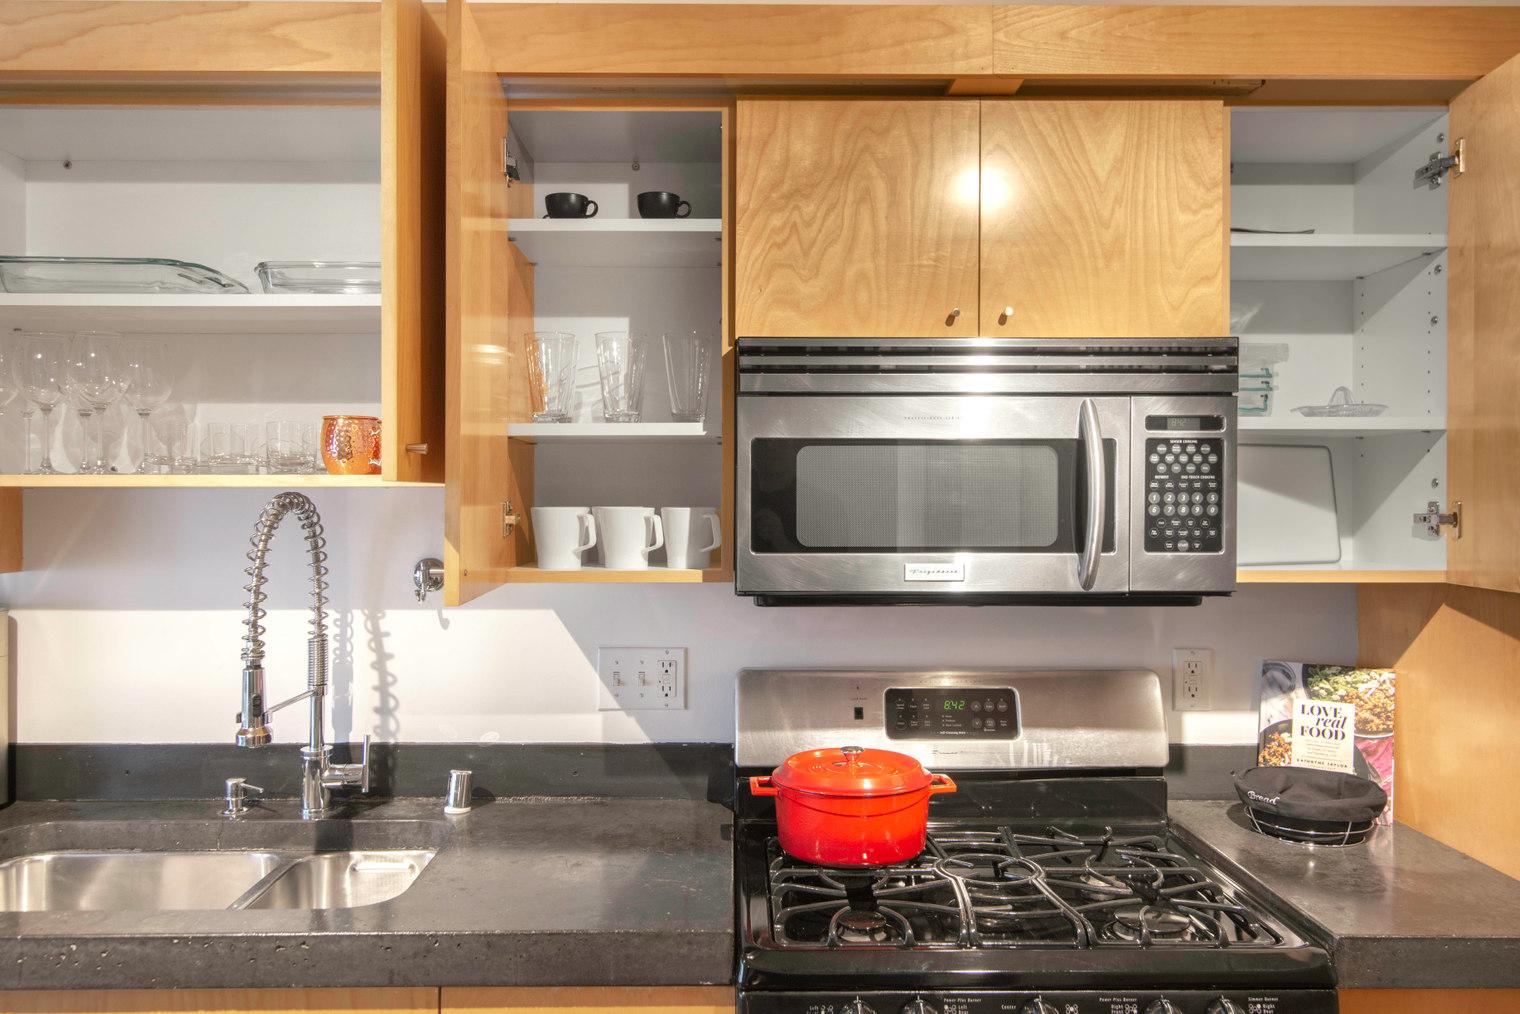 Kitchen Facilities at Glasdore Lofts Apartment